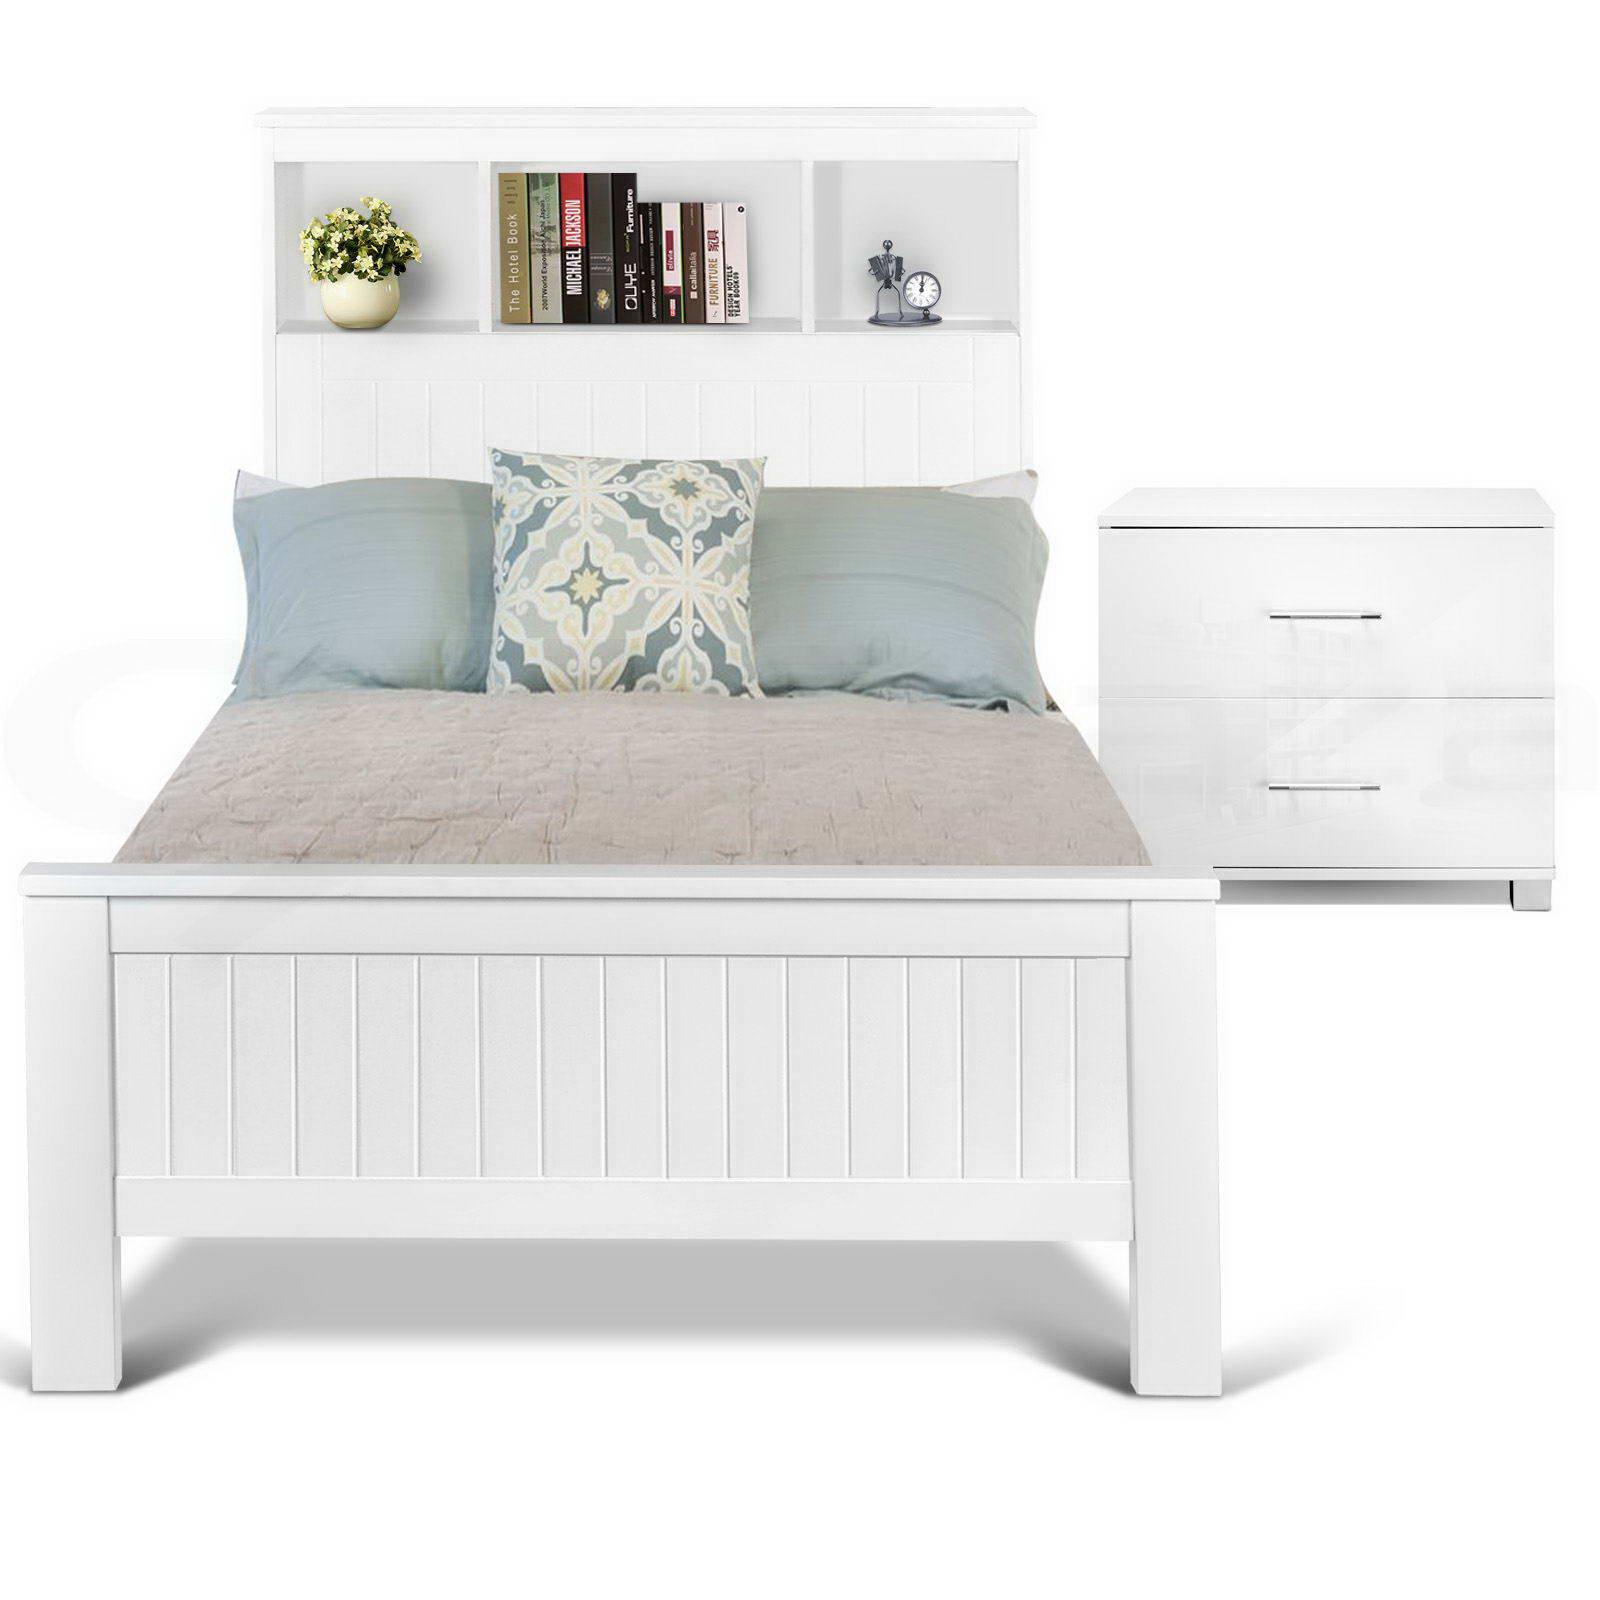 Wooden Bed Frame CONQUEROR King Single Shelf Bookcase Pine